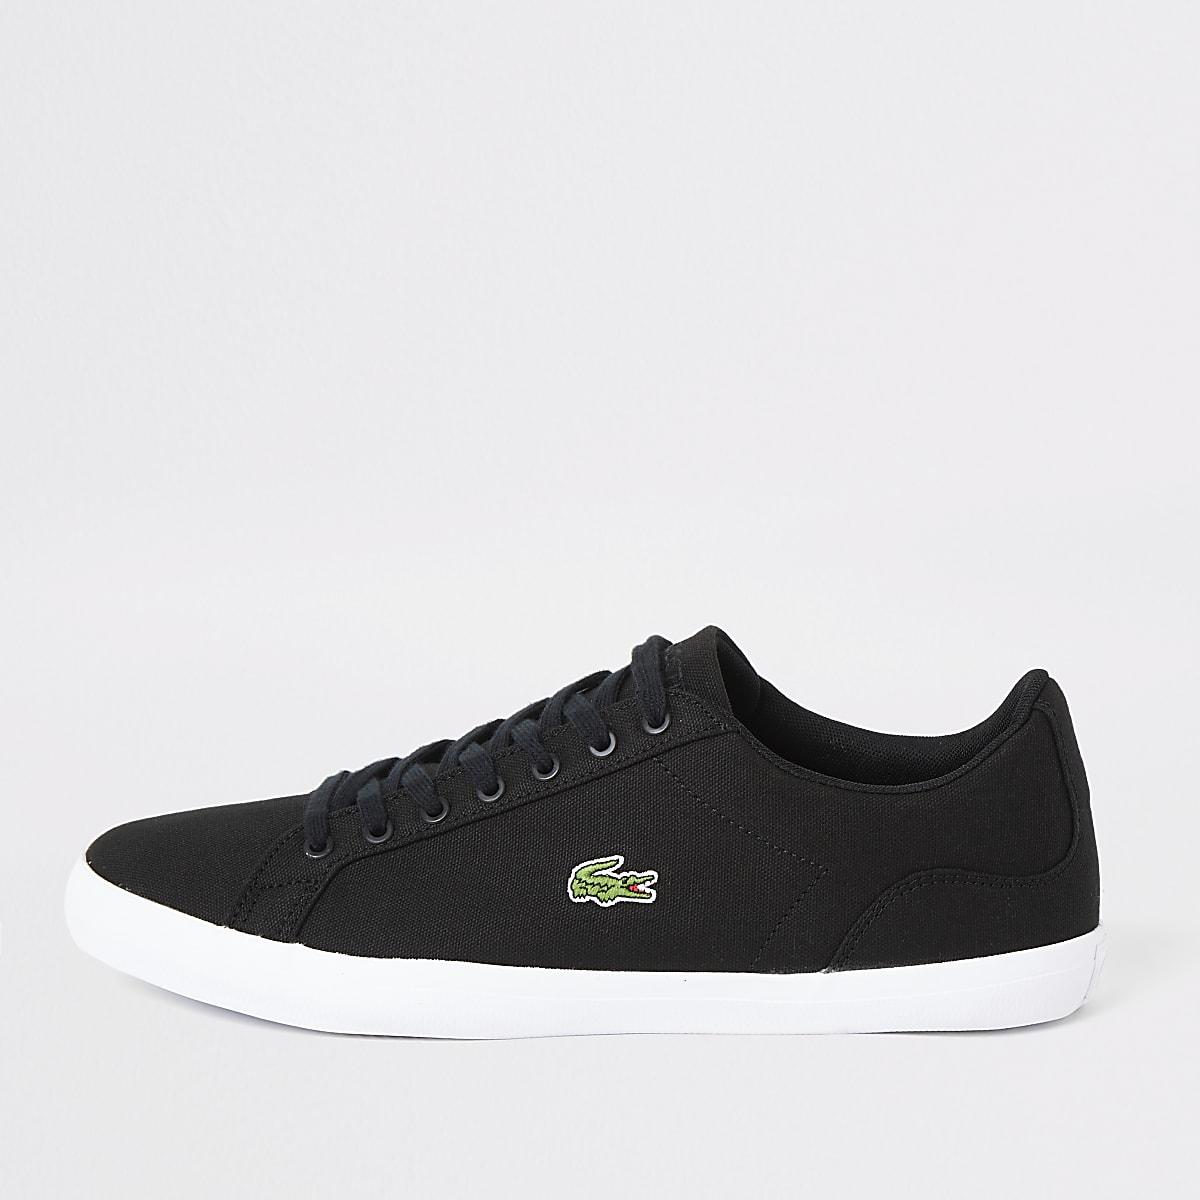 Lacoste black Lerond canvas sneakers